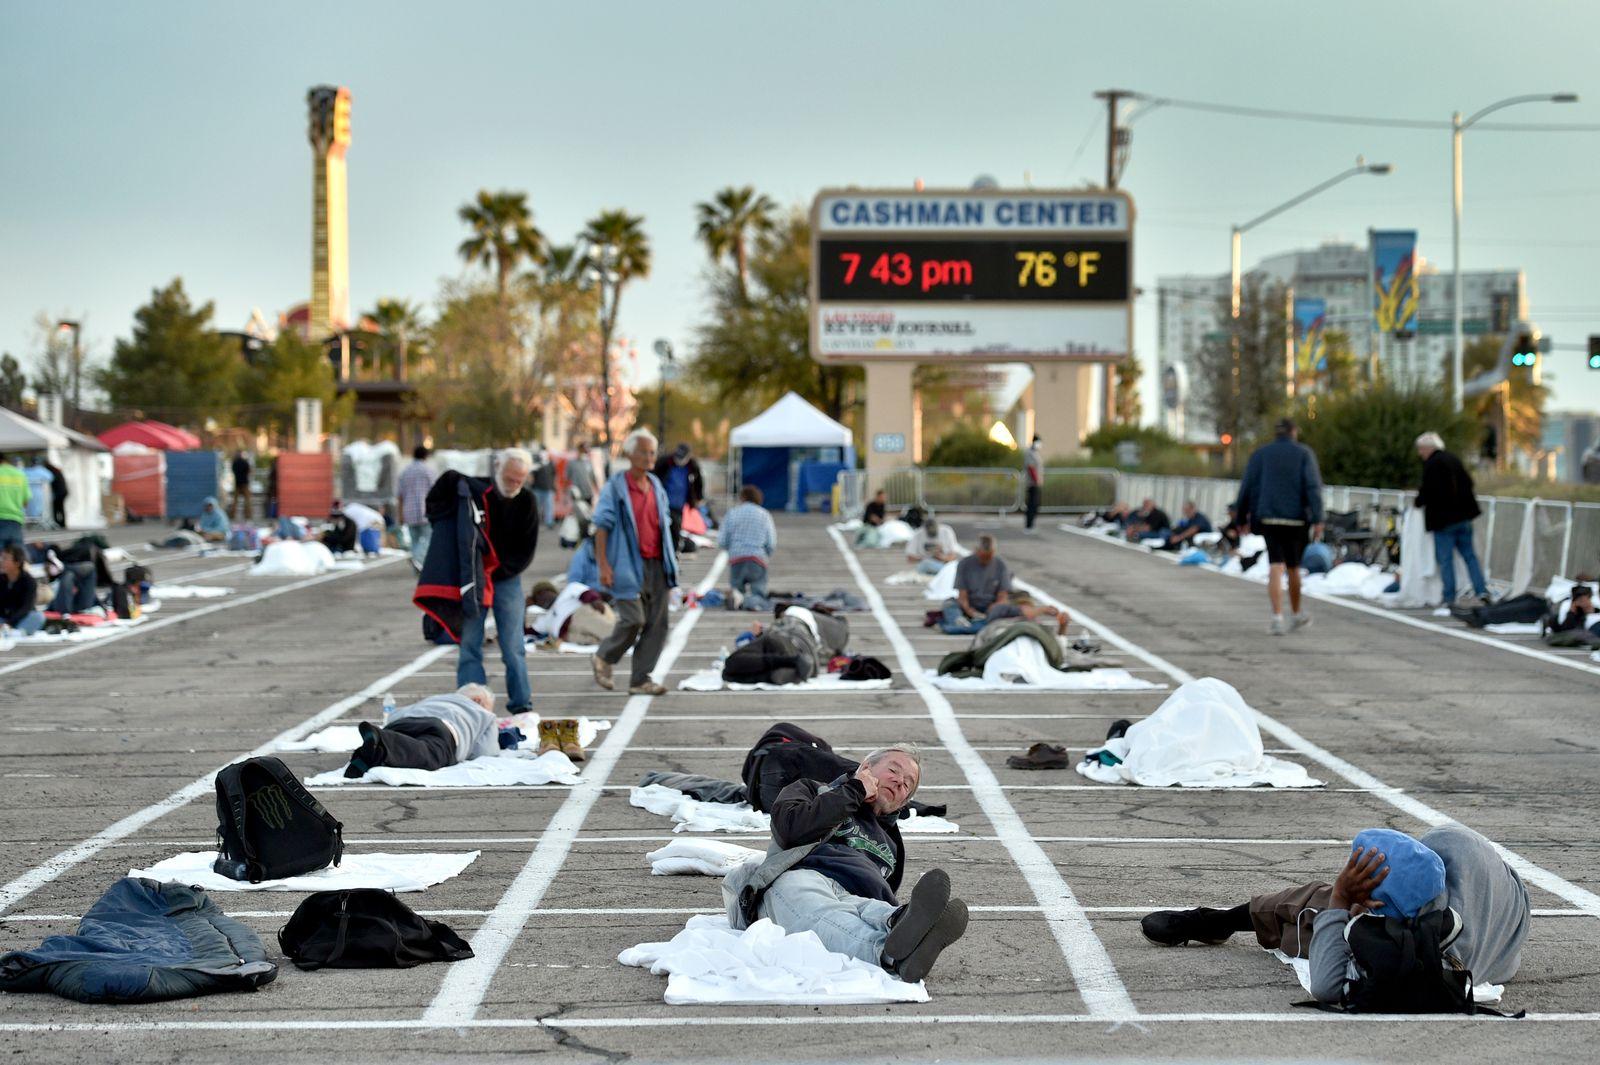 Las Vegas parking lot turns into shelter for the homeless amid coronavirus pandemic, USA - 31 Mar 2020